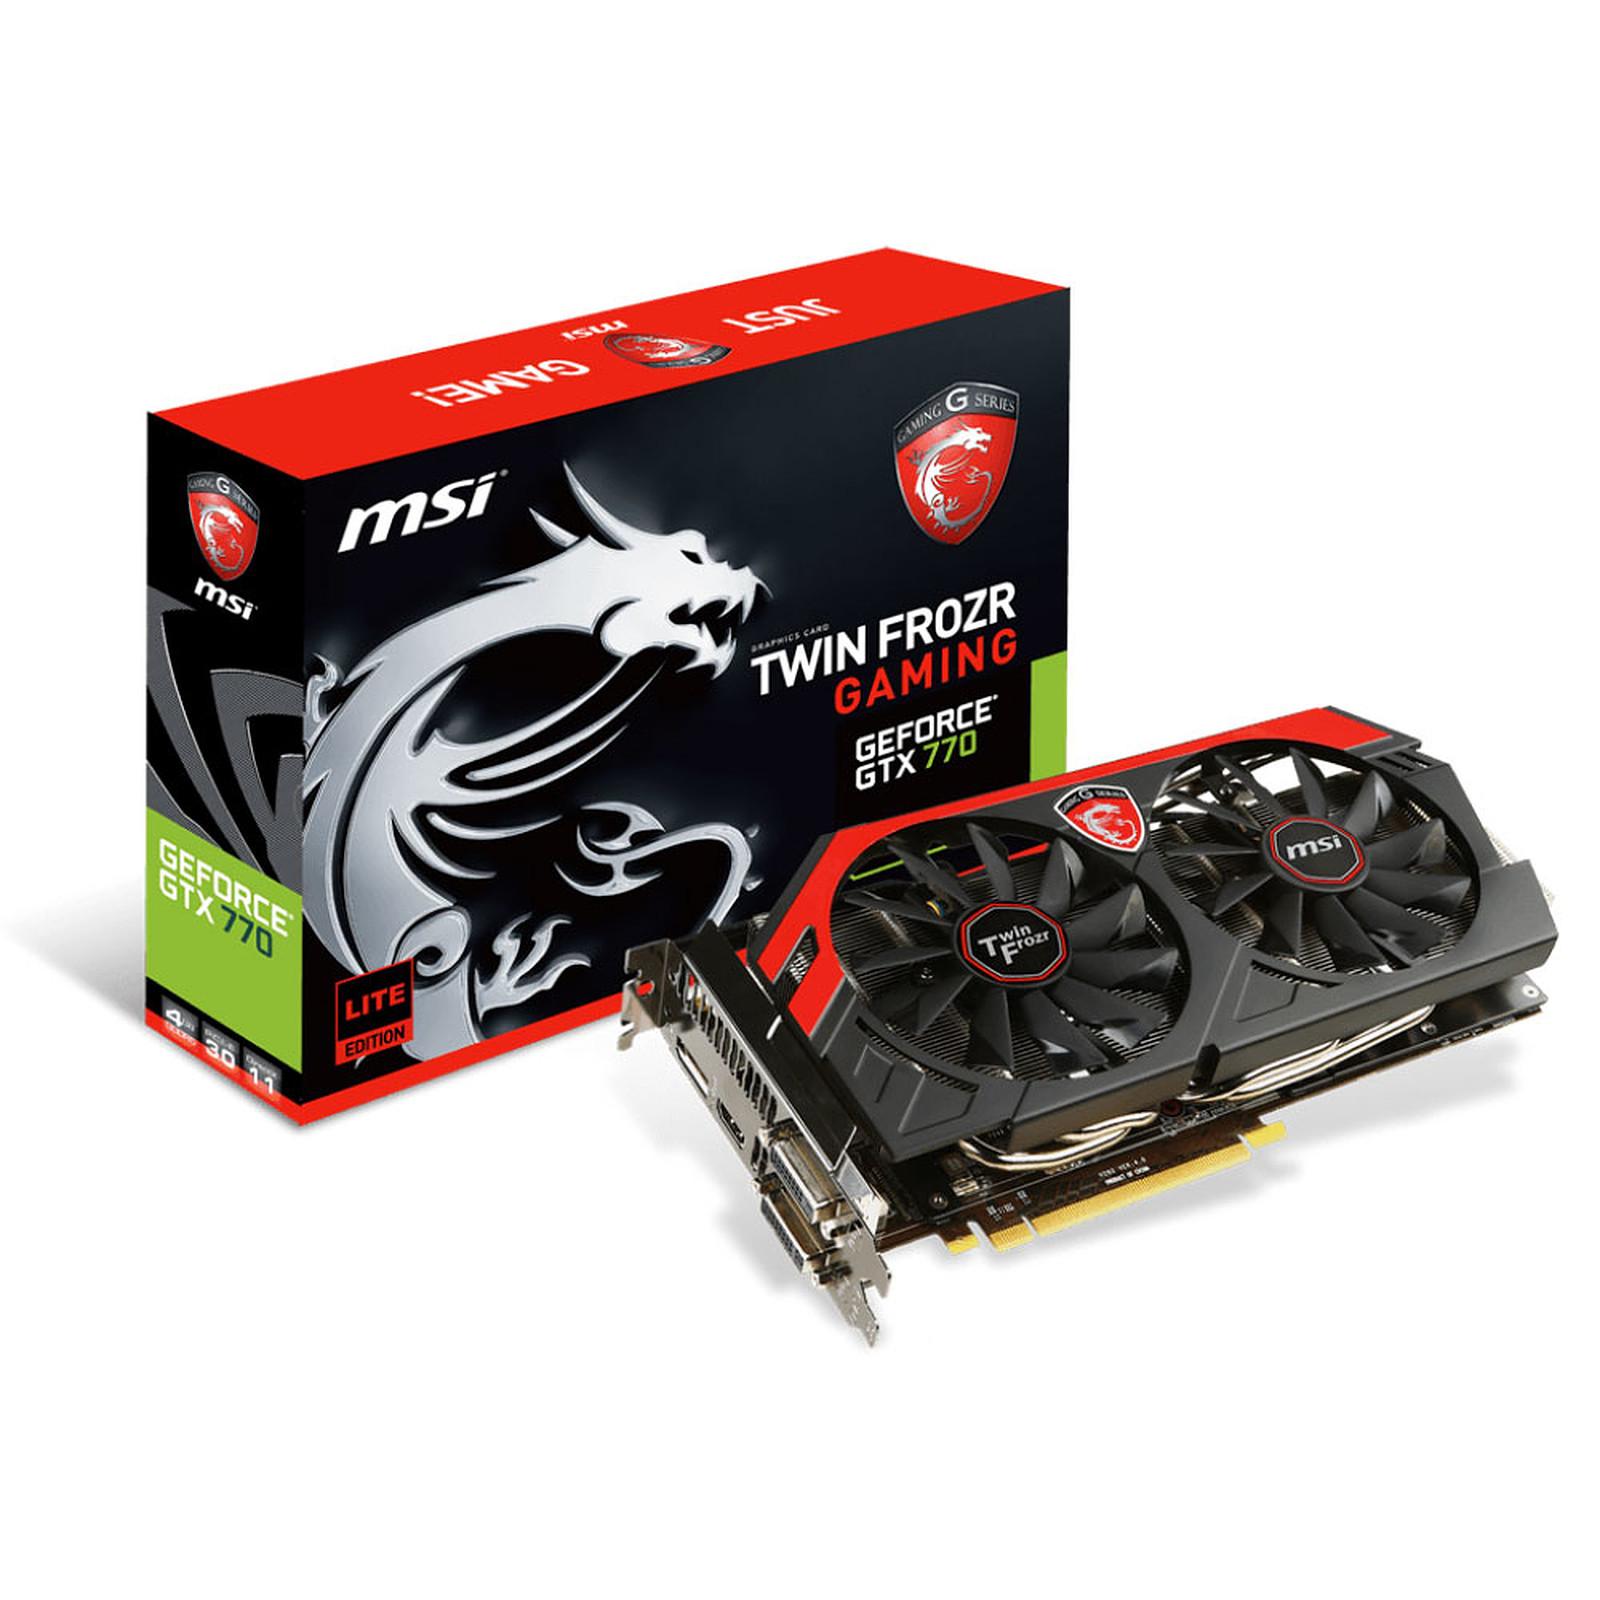 MSI GeForce GTX 770 Twin Frozr GAMING 2GB